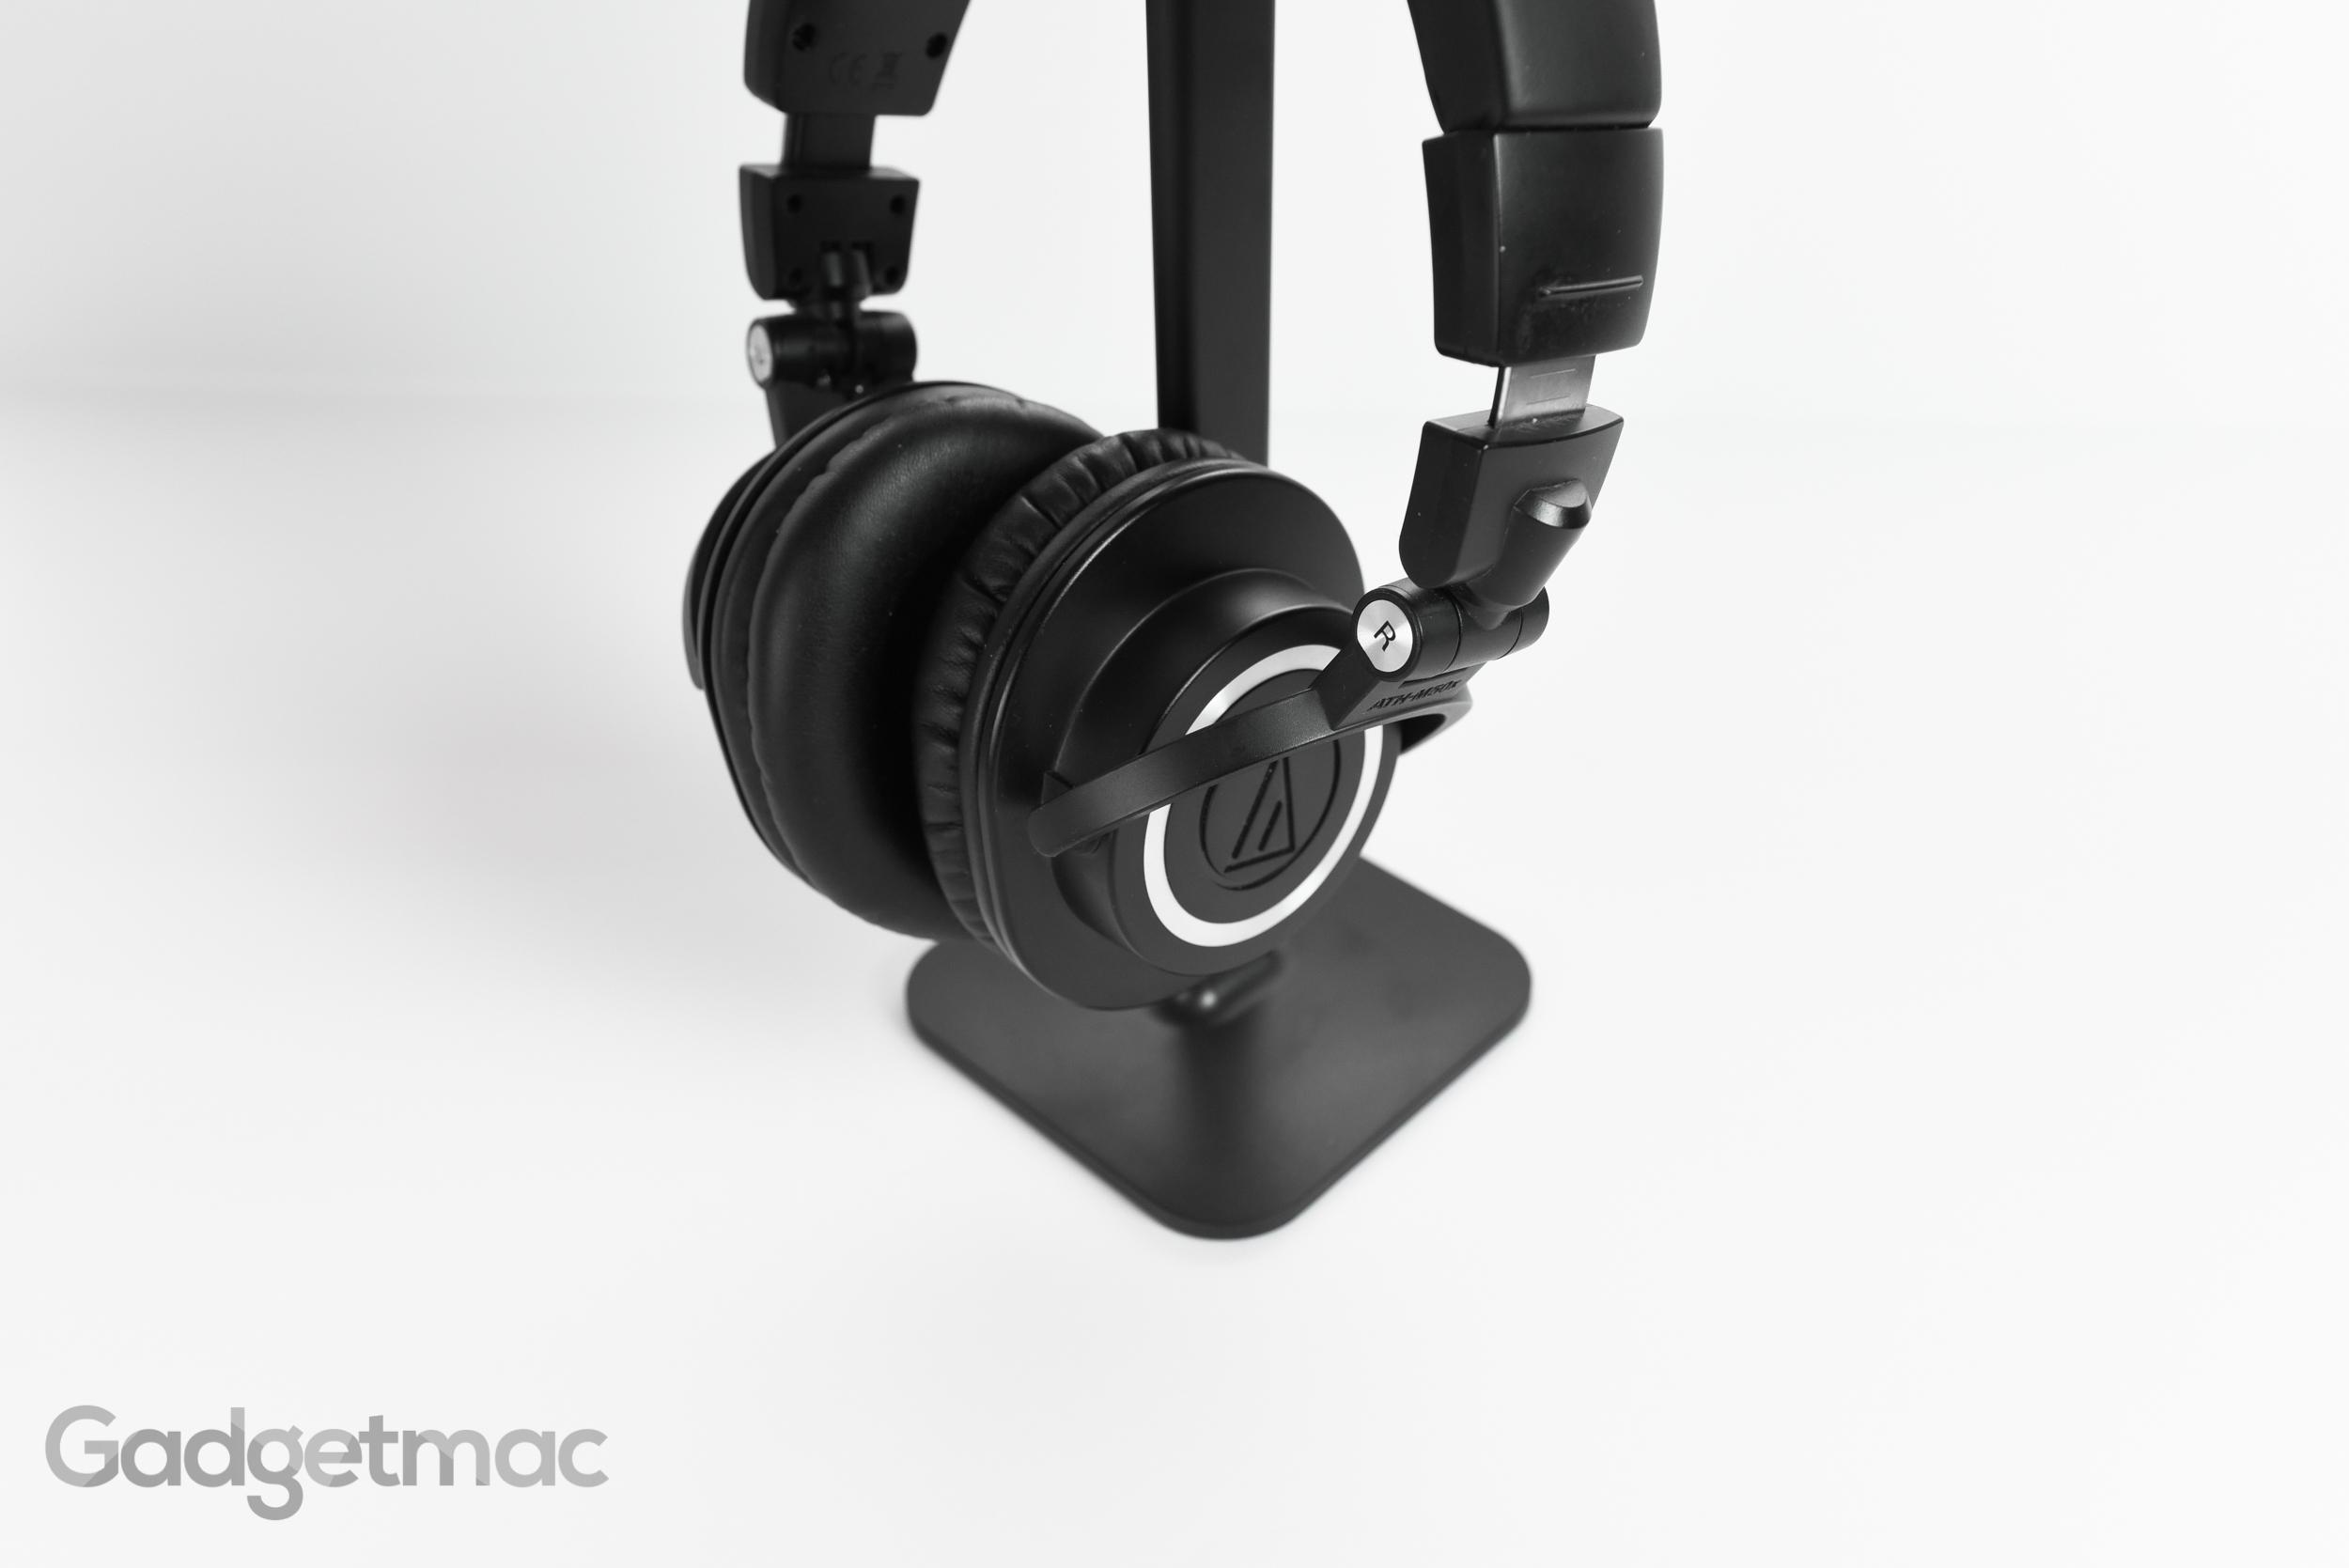 bluelounge_posto_headphone_stand_clamping_2.jpg